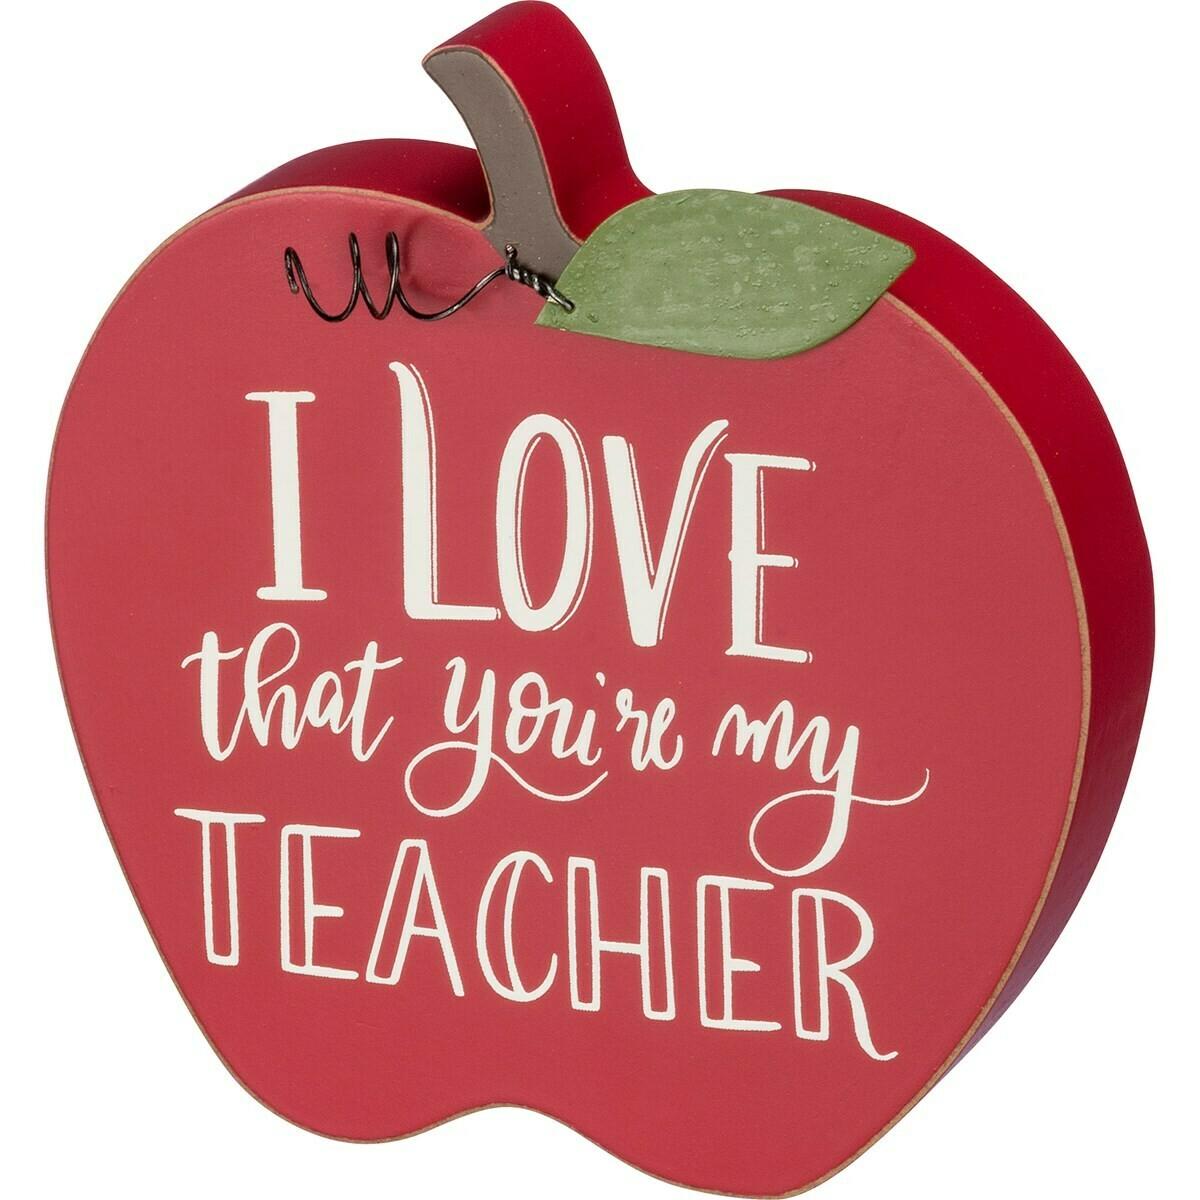 Teacher Apple Sitter